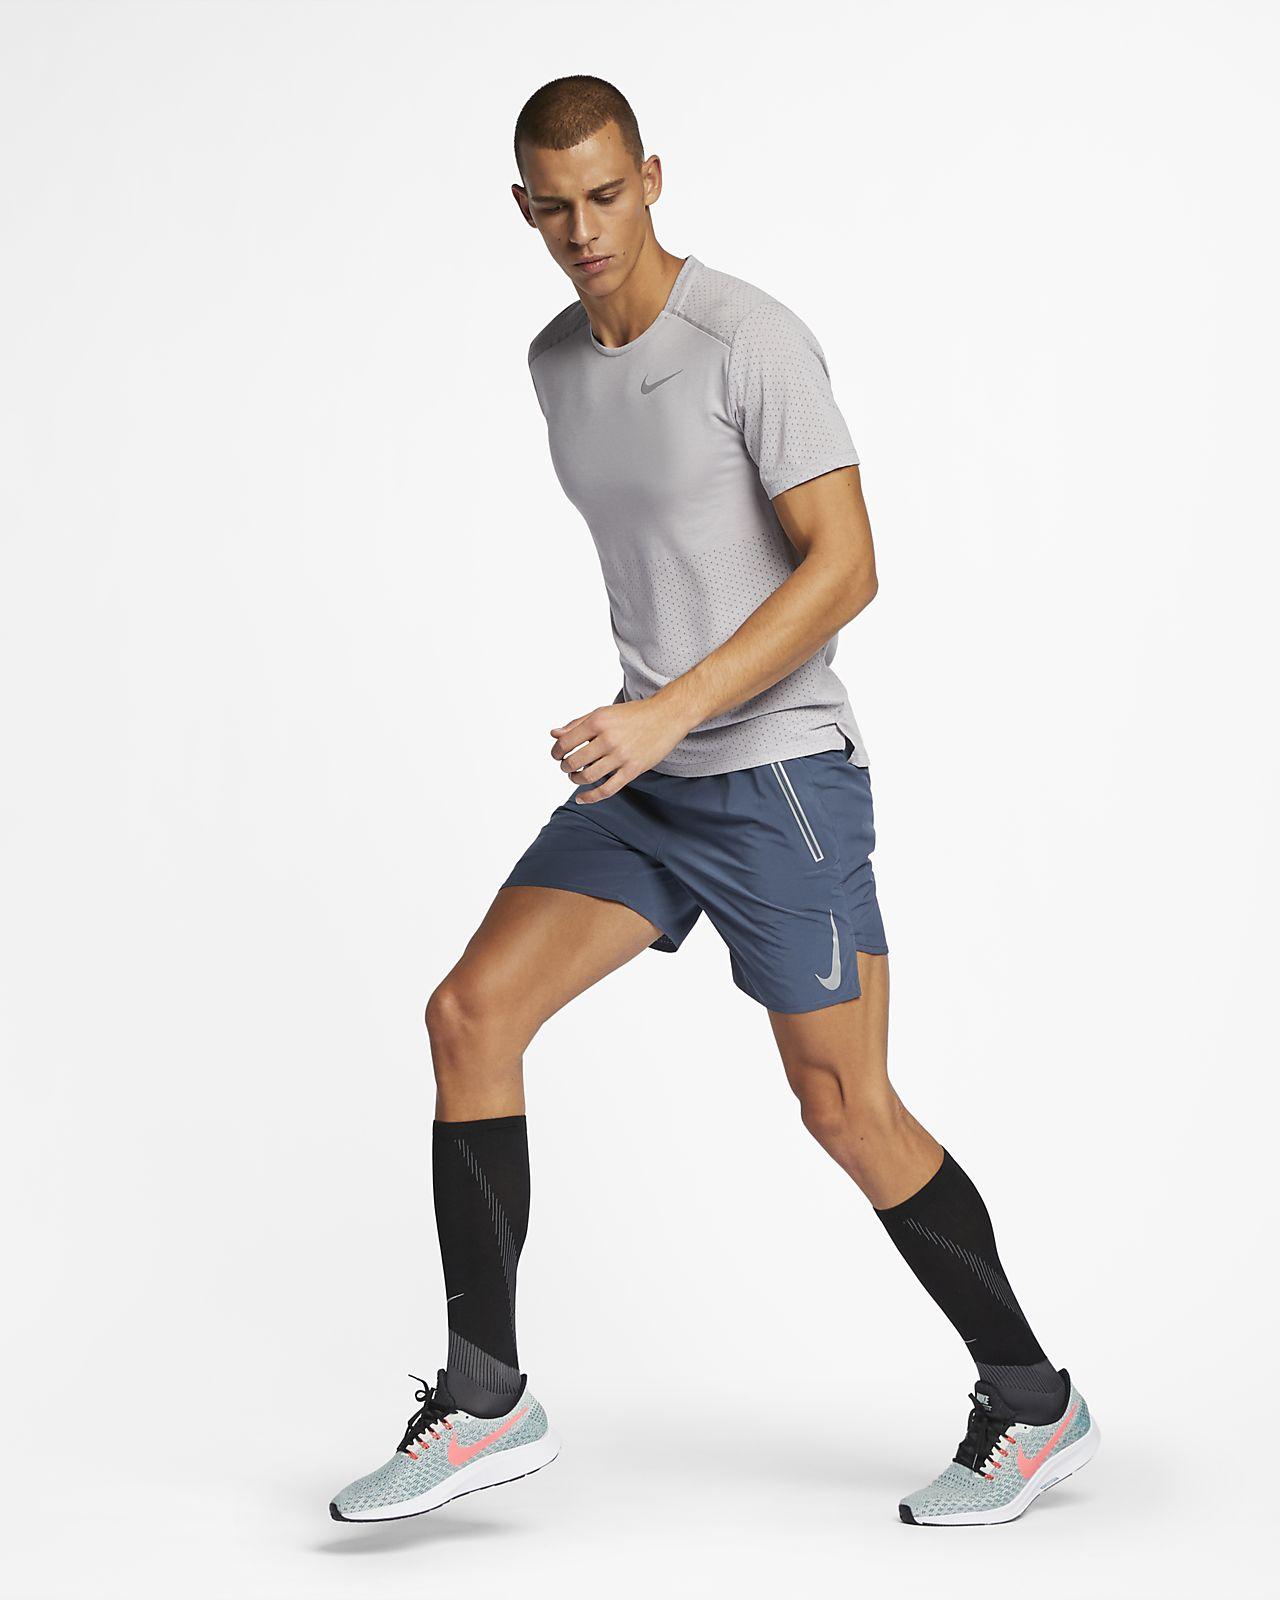 Camisola de running de manga curta Nike Rise 365 para homem